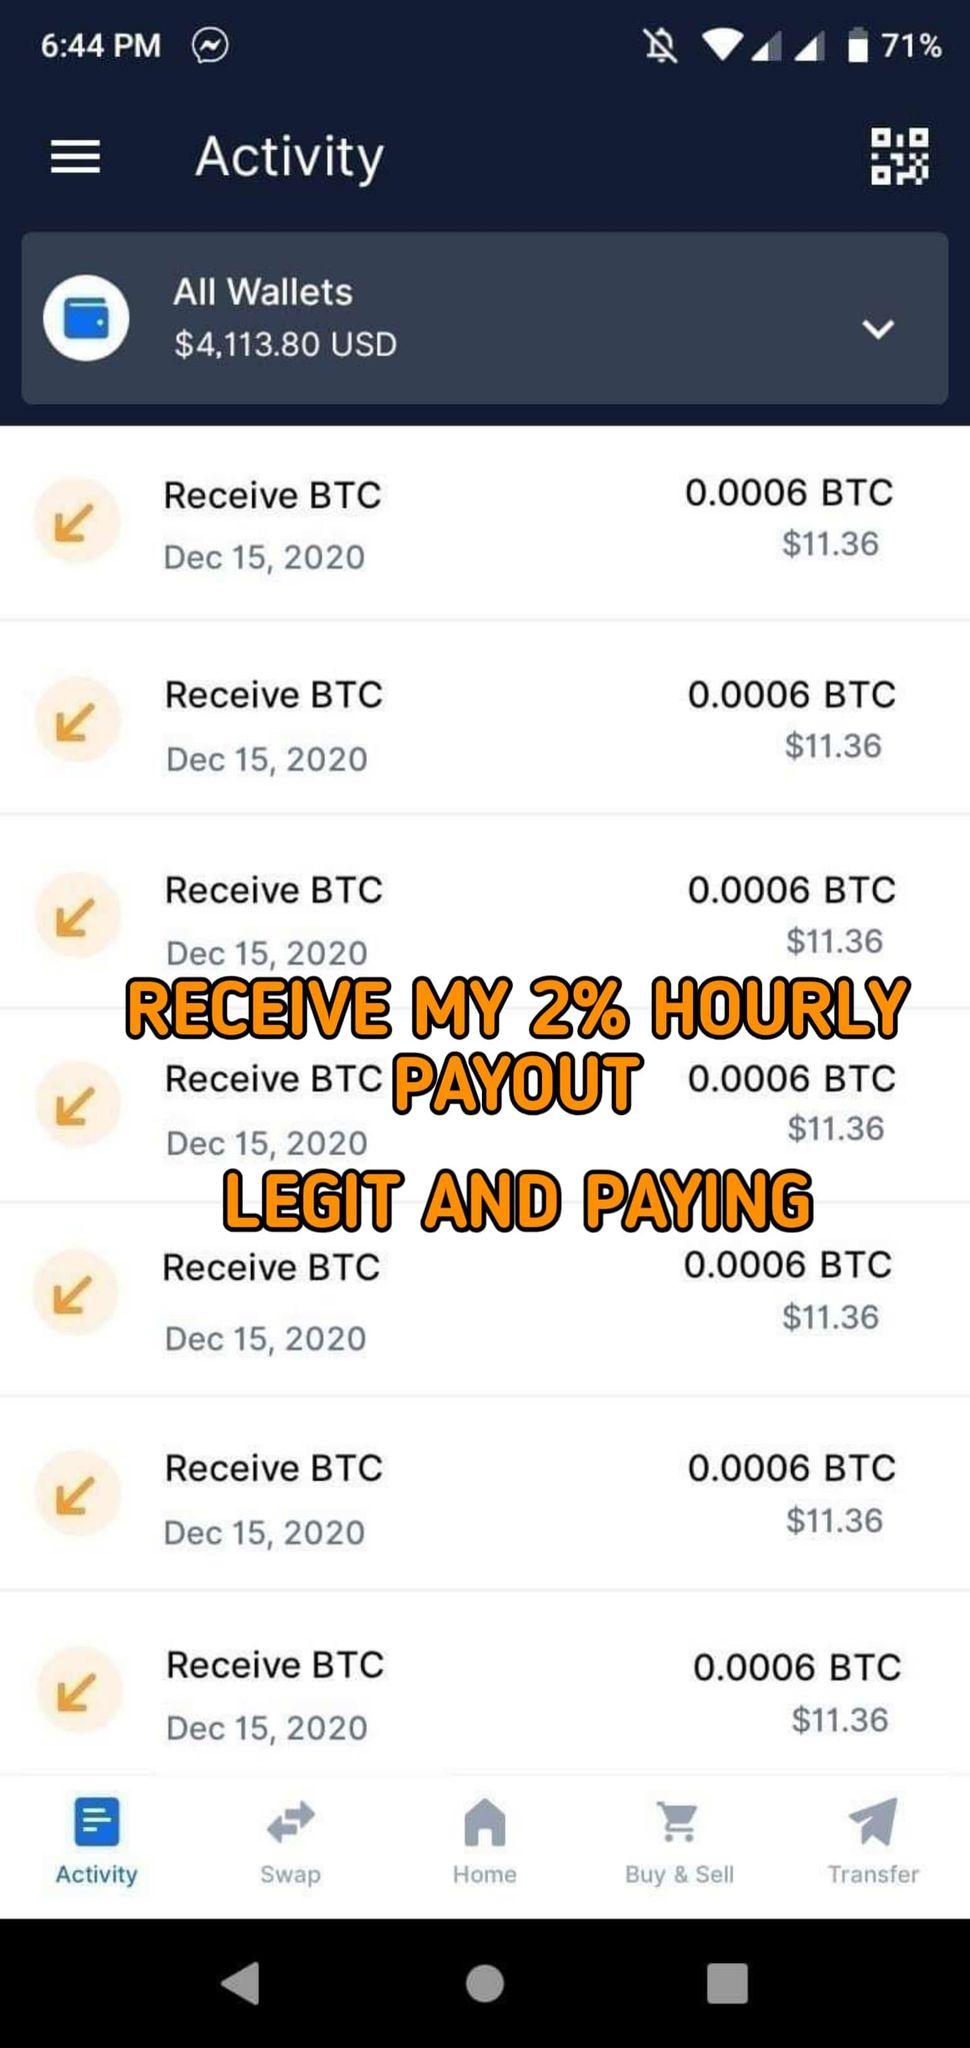 shane23 payment1.jpg